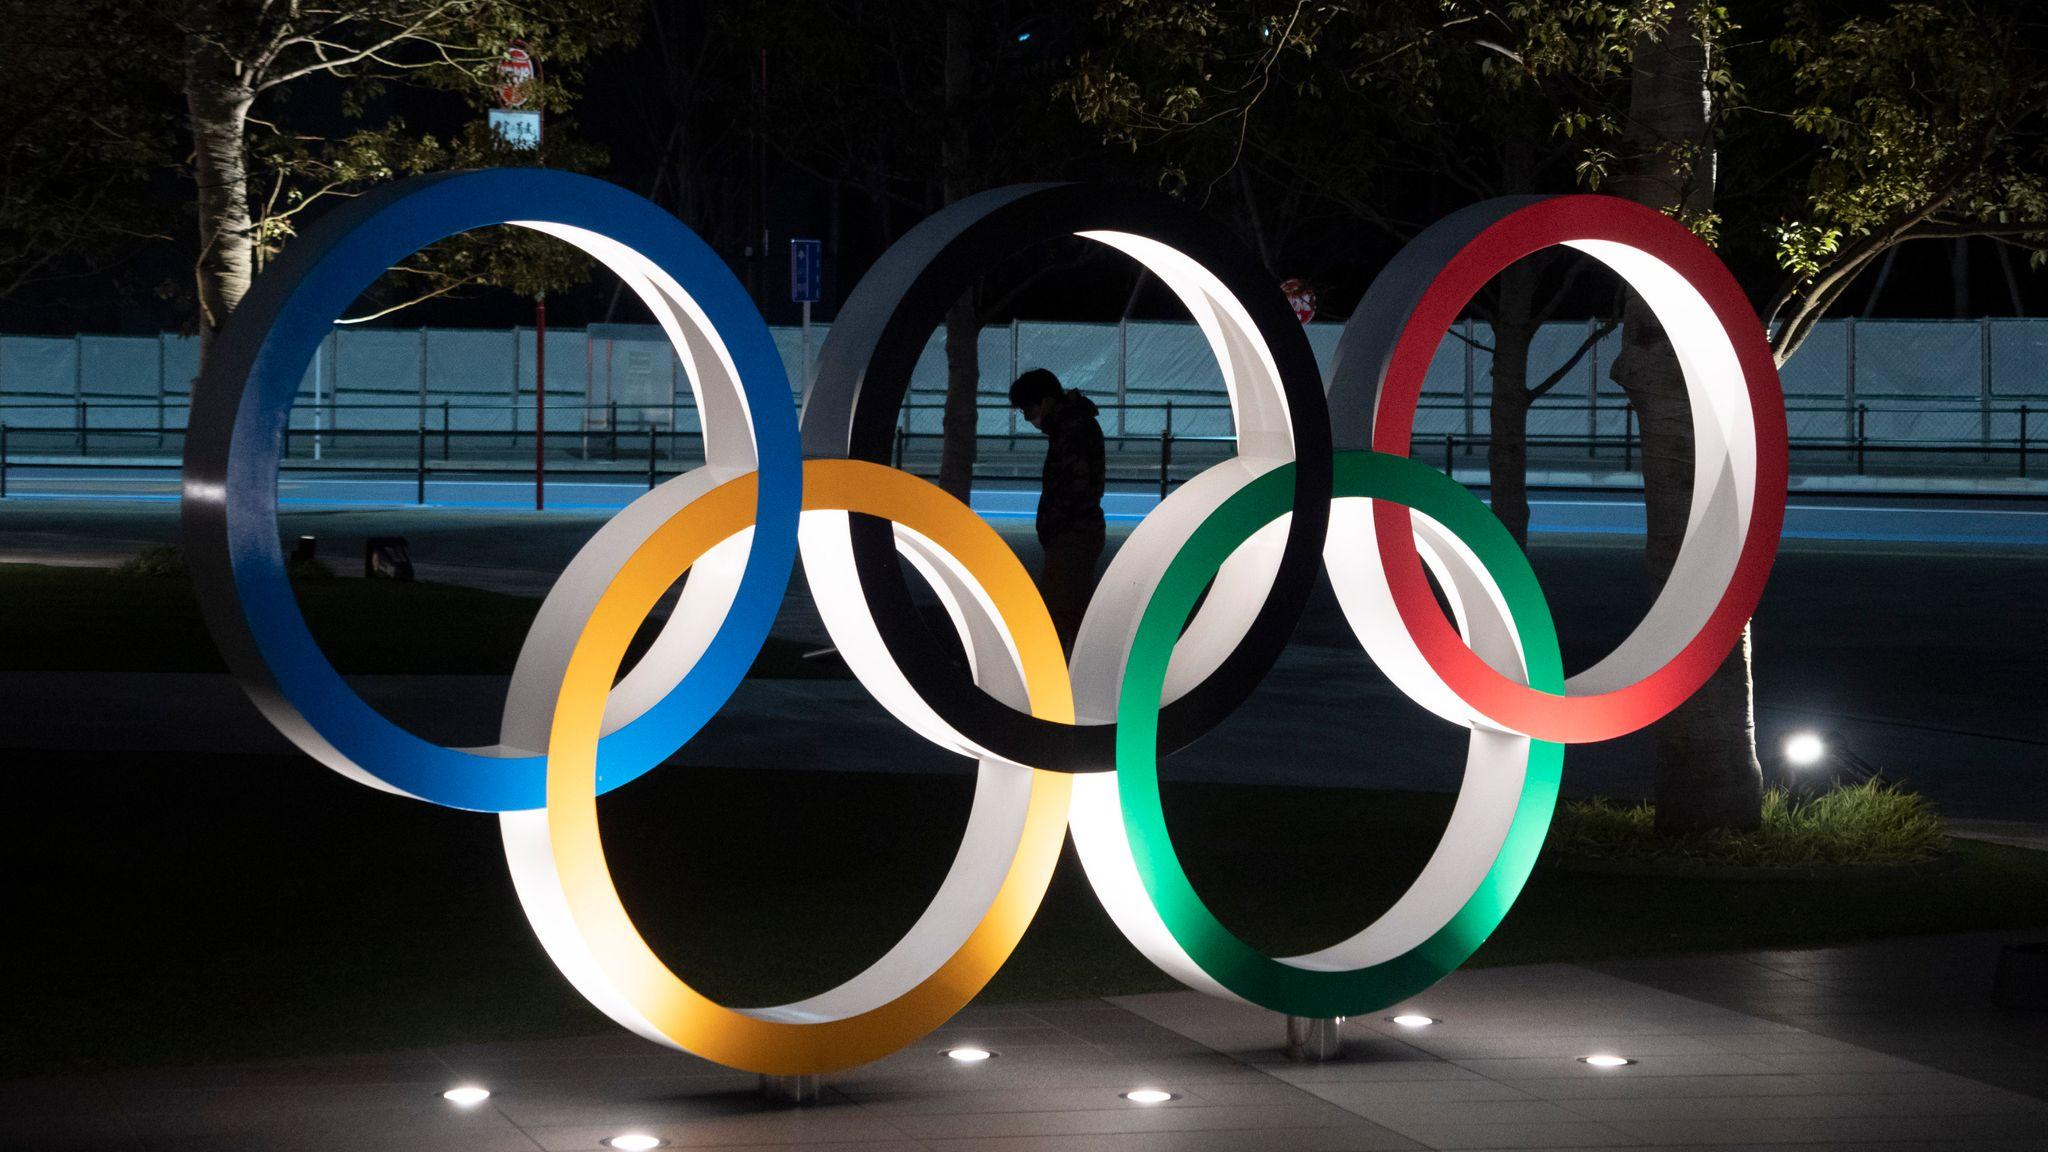 Nrl premiership betting 2021 olympics knuckleball tips football betting